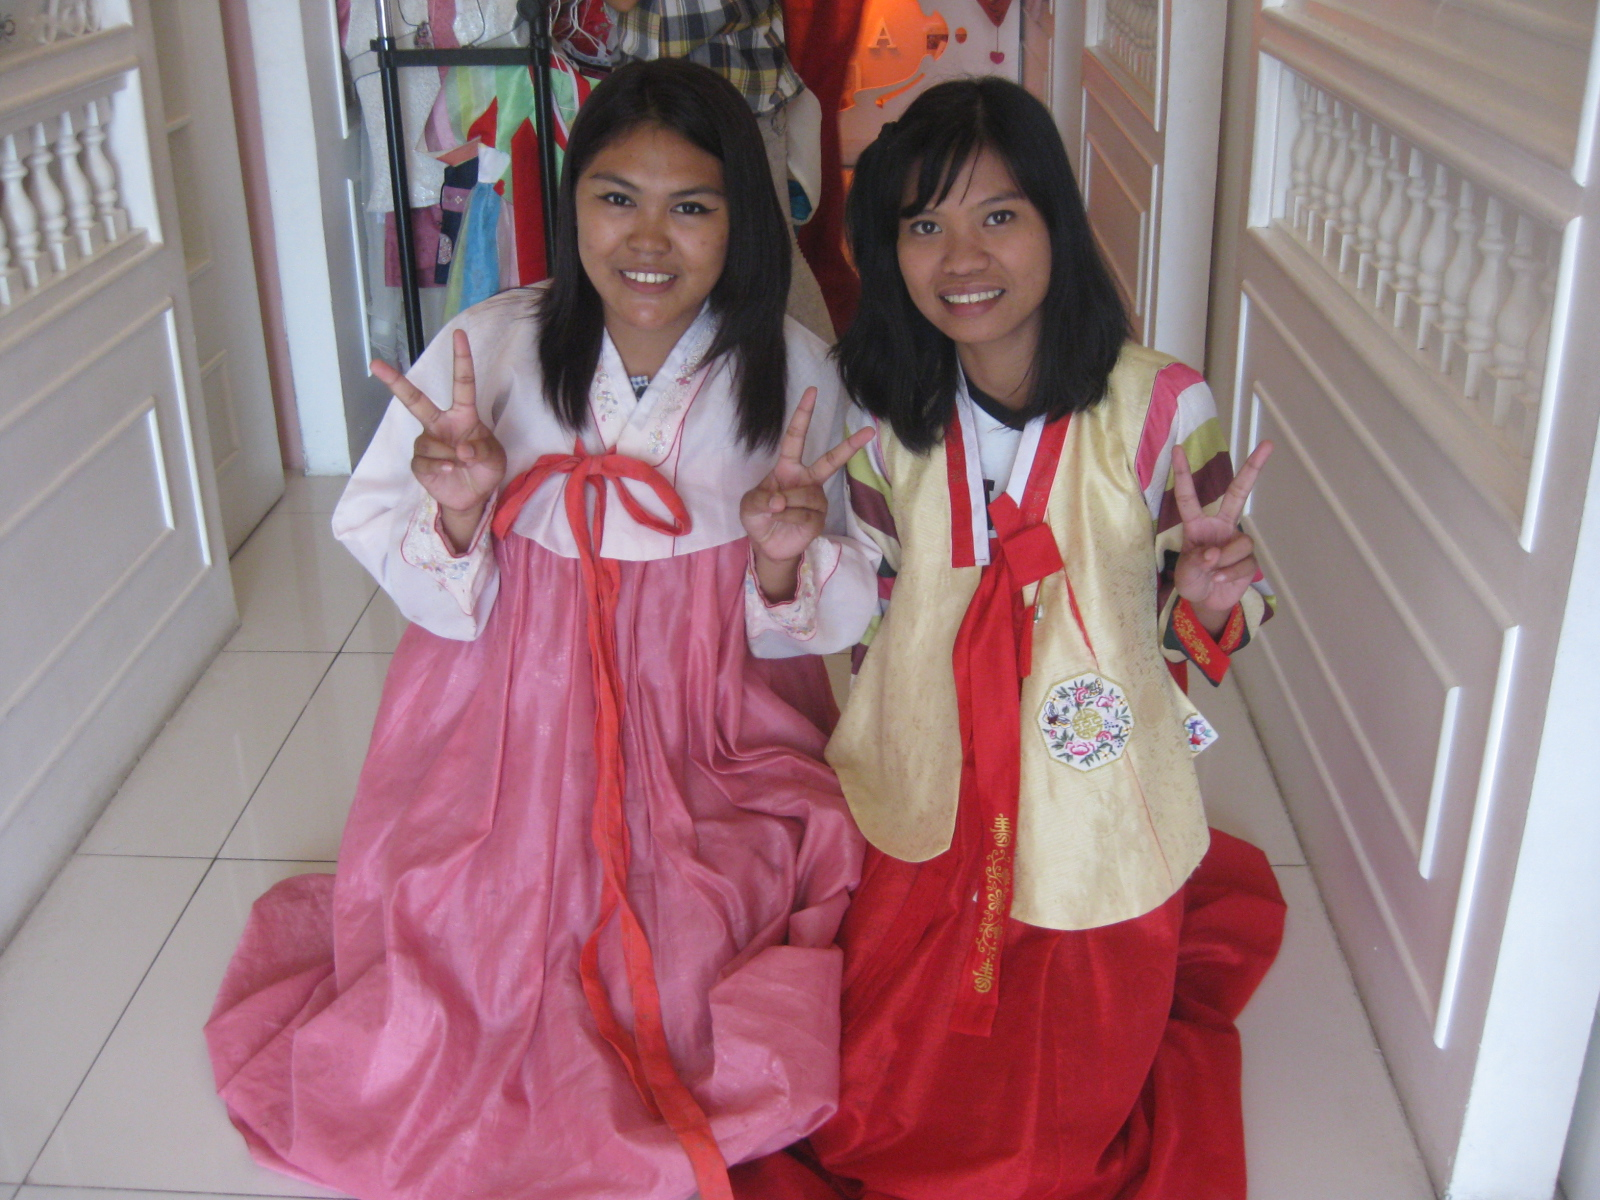 Let's Wear Hanbok at Cafe Tiala | vanessasabroso.com